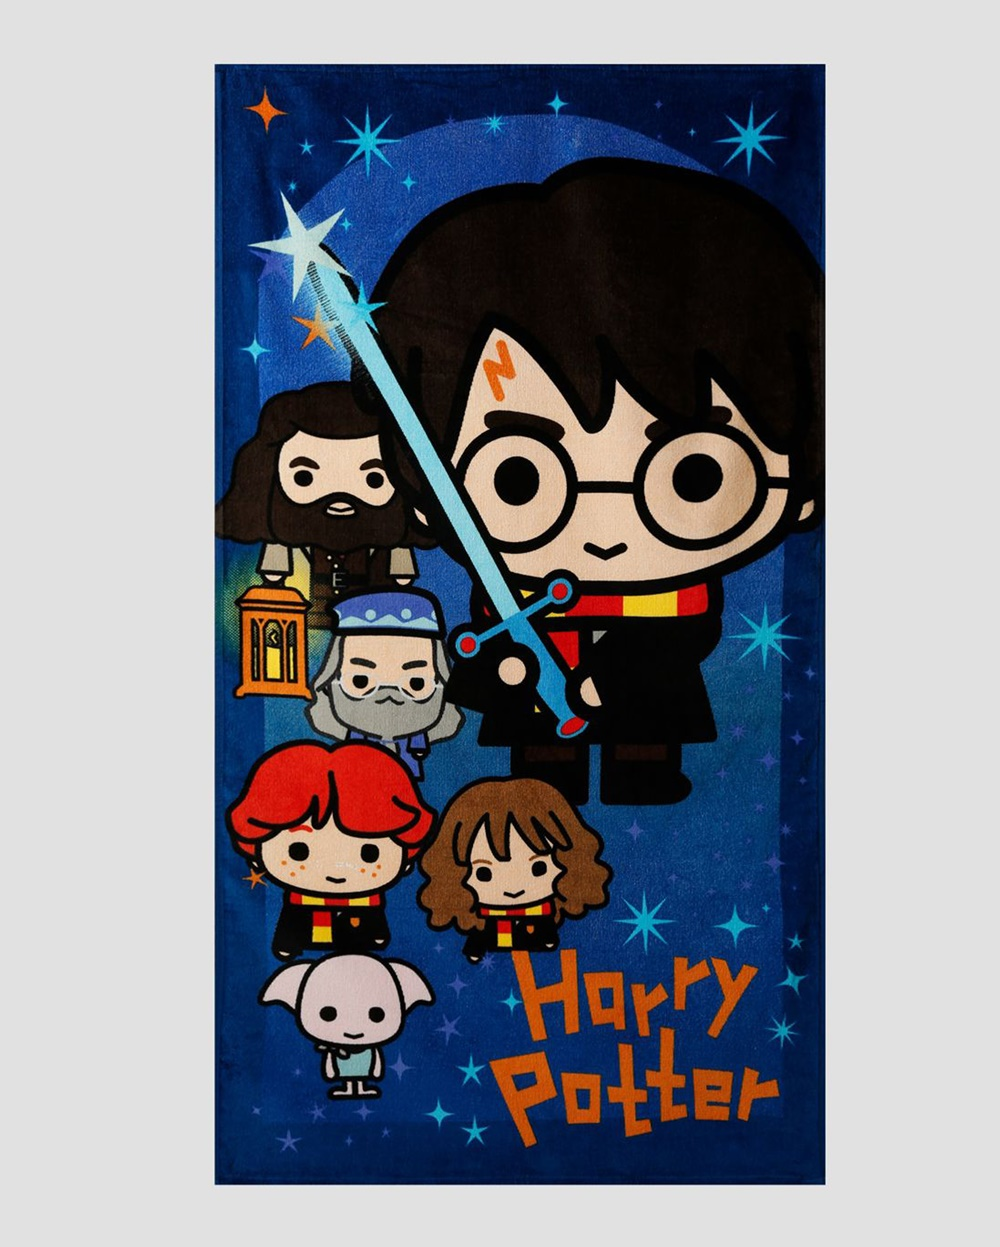 Toalha Funko Harry Potter 19,90